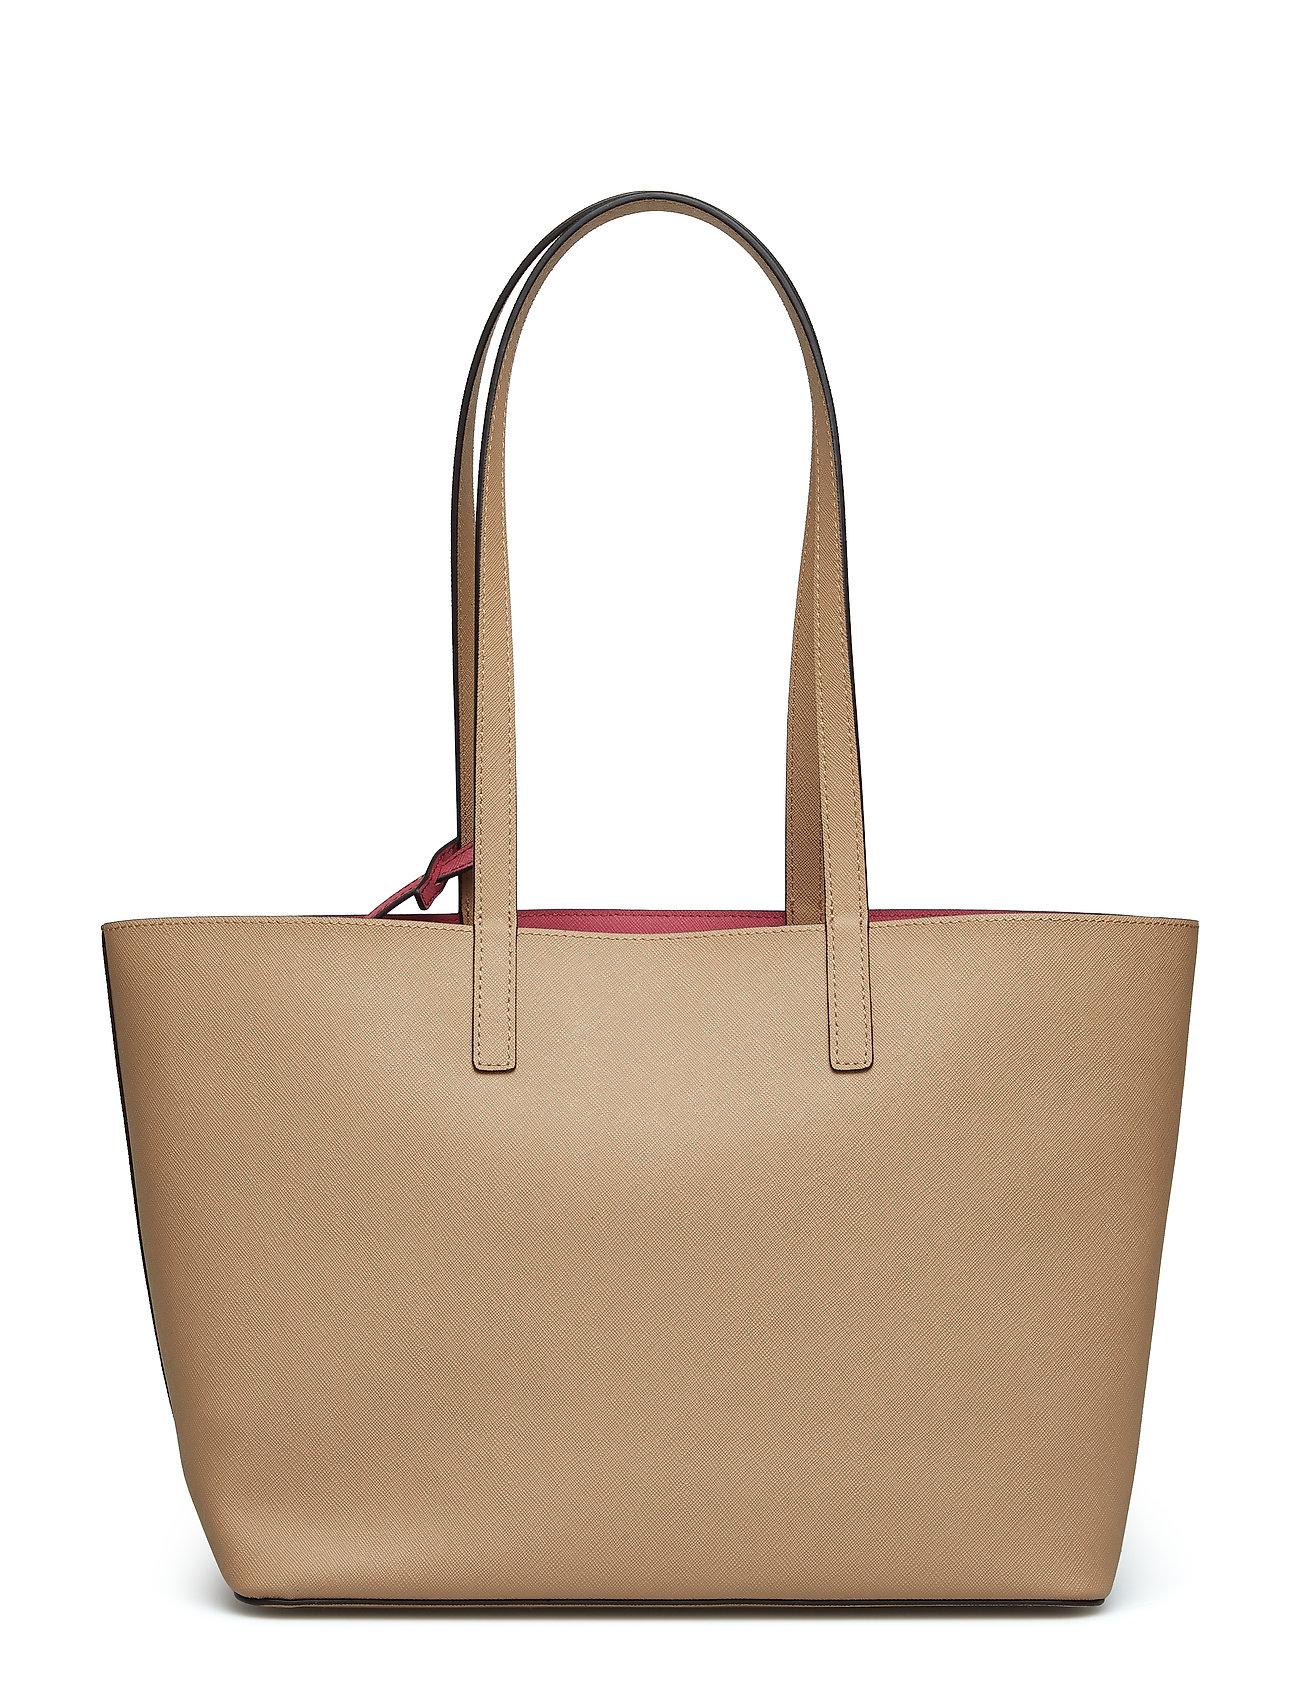 pinkDkny pinkDkny pinkDkny pinkDkny Bags Bags Bags Braydenlatte Braydenlatte Braydenlatte Braydenlatte MqUVGpSz